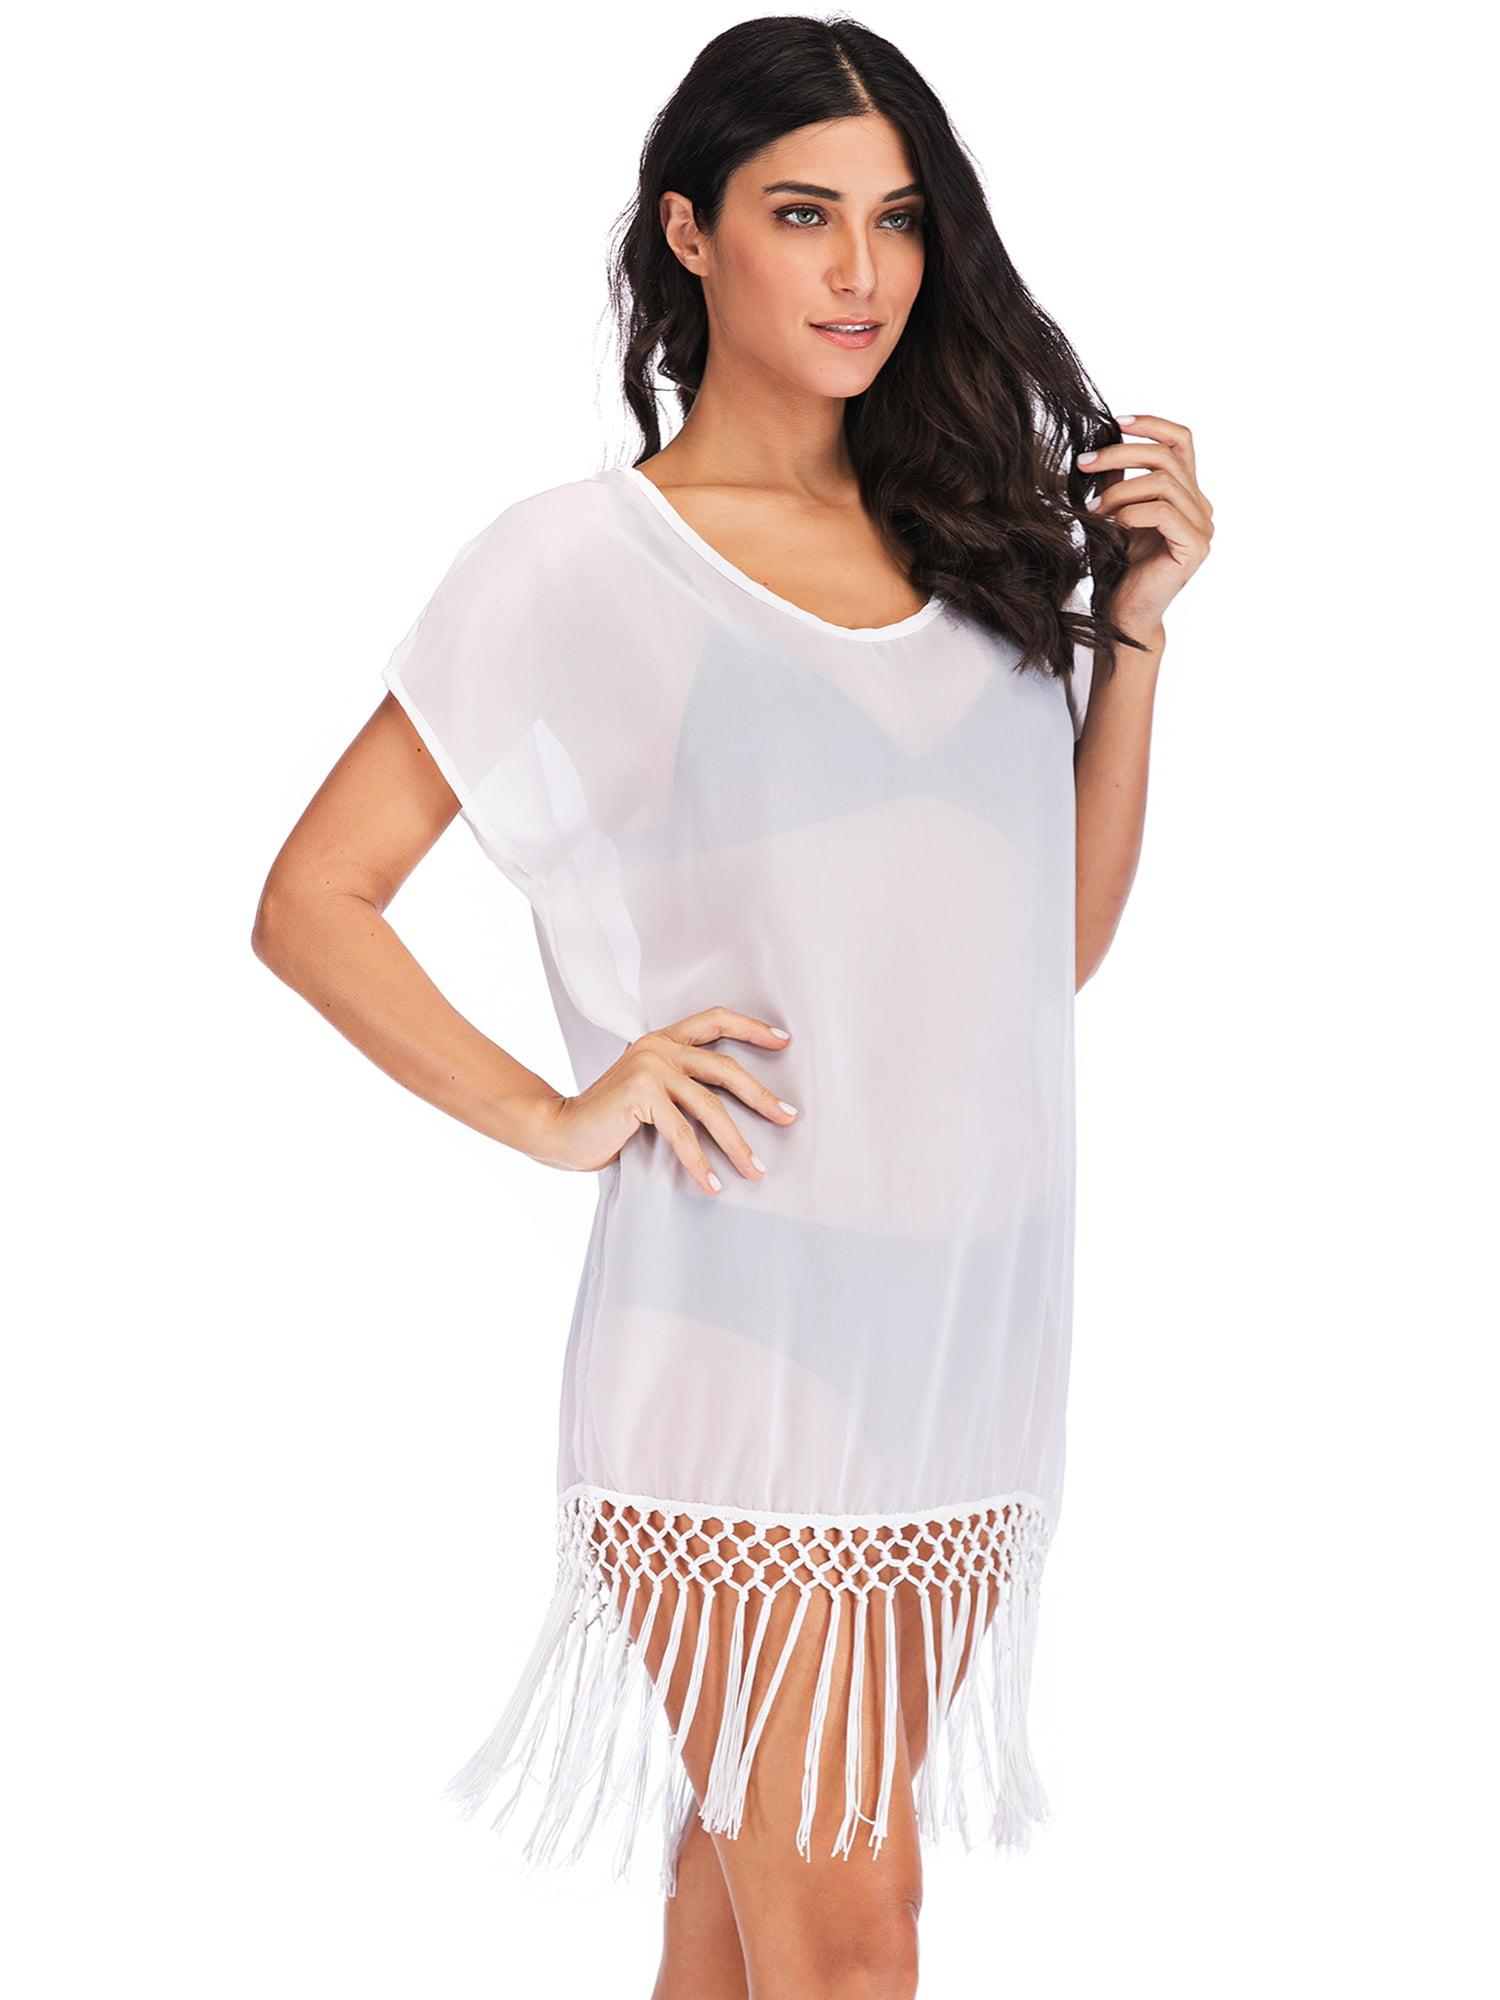 8c9e9abe33 Lelinta - LELINTA Women's Chiffon Tassel Beach Bathing Swimsuit Cover Up  Bikini Wrap Beach Dress Black/White - Walmart.com